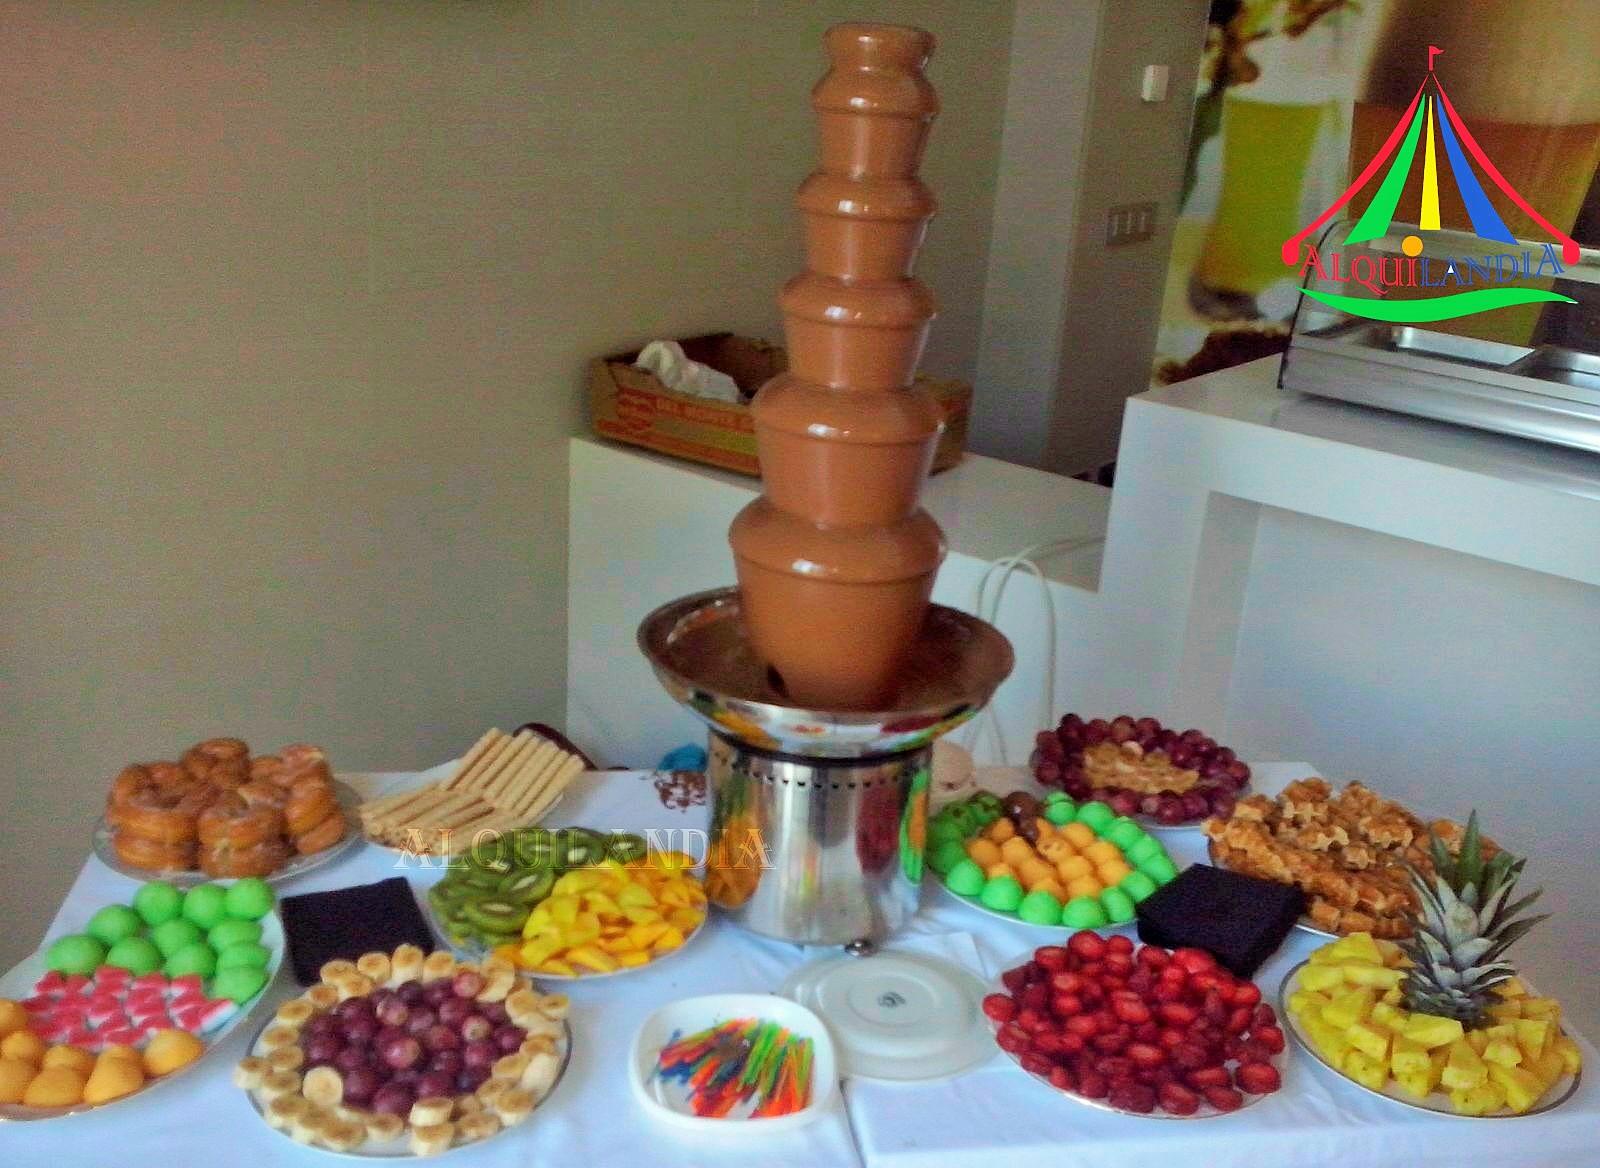 FUENTE-DE-CHOCOLATE-WWW.ALQUILANDIASEVILLA.COM